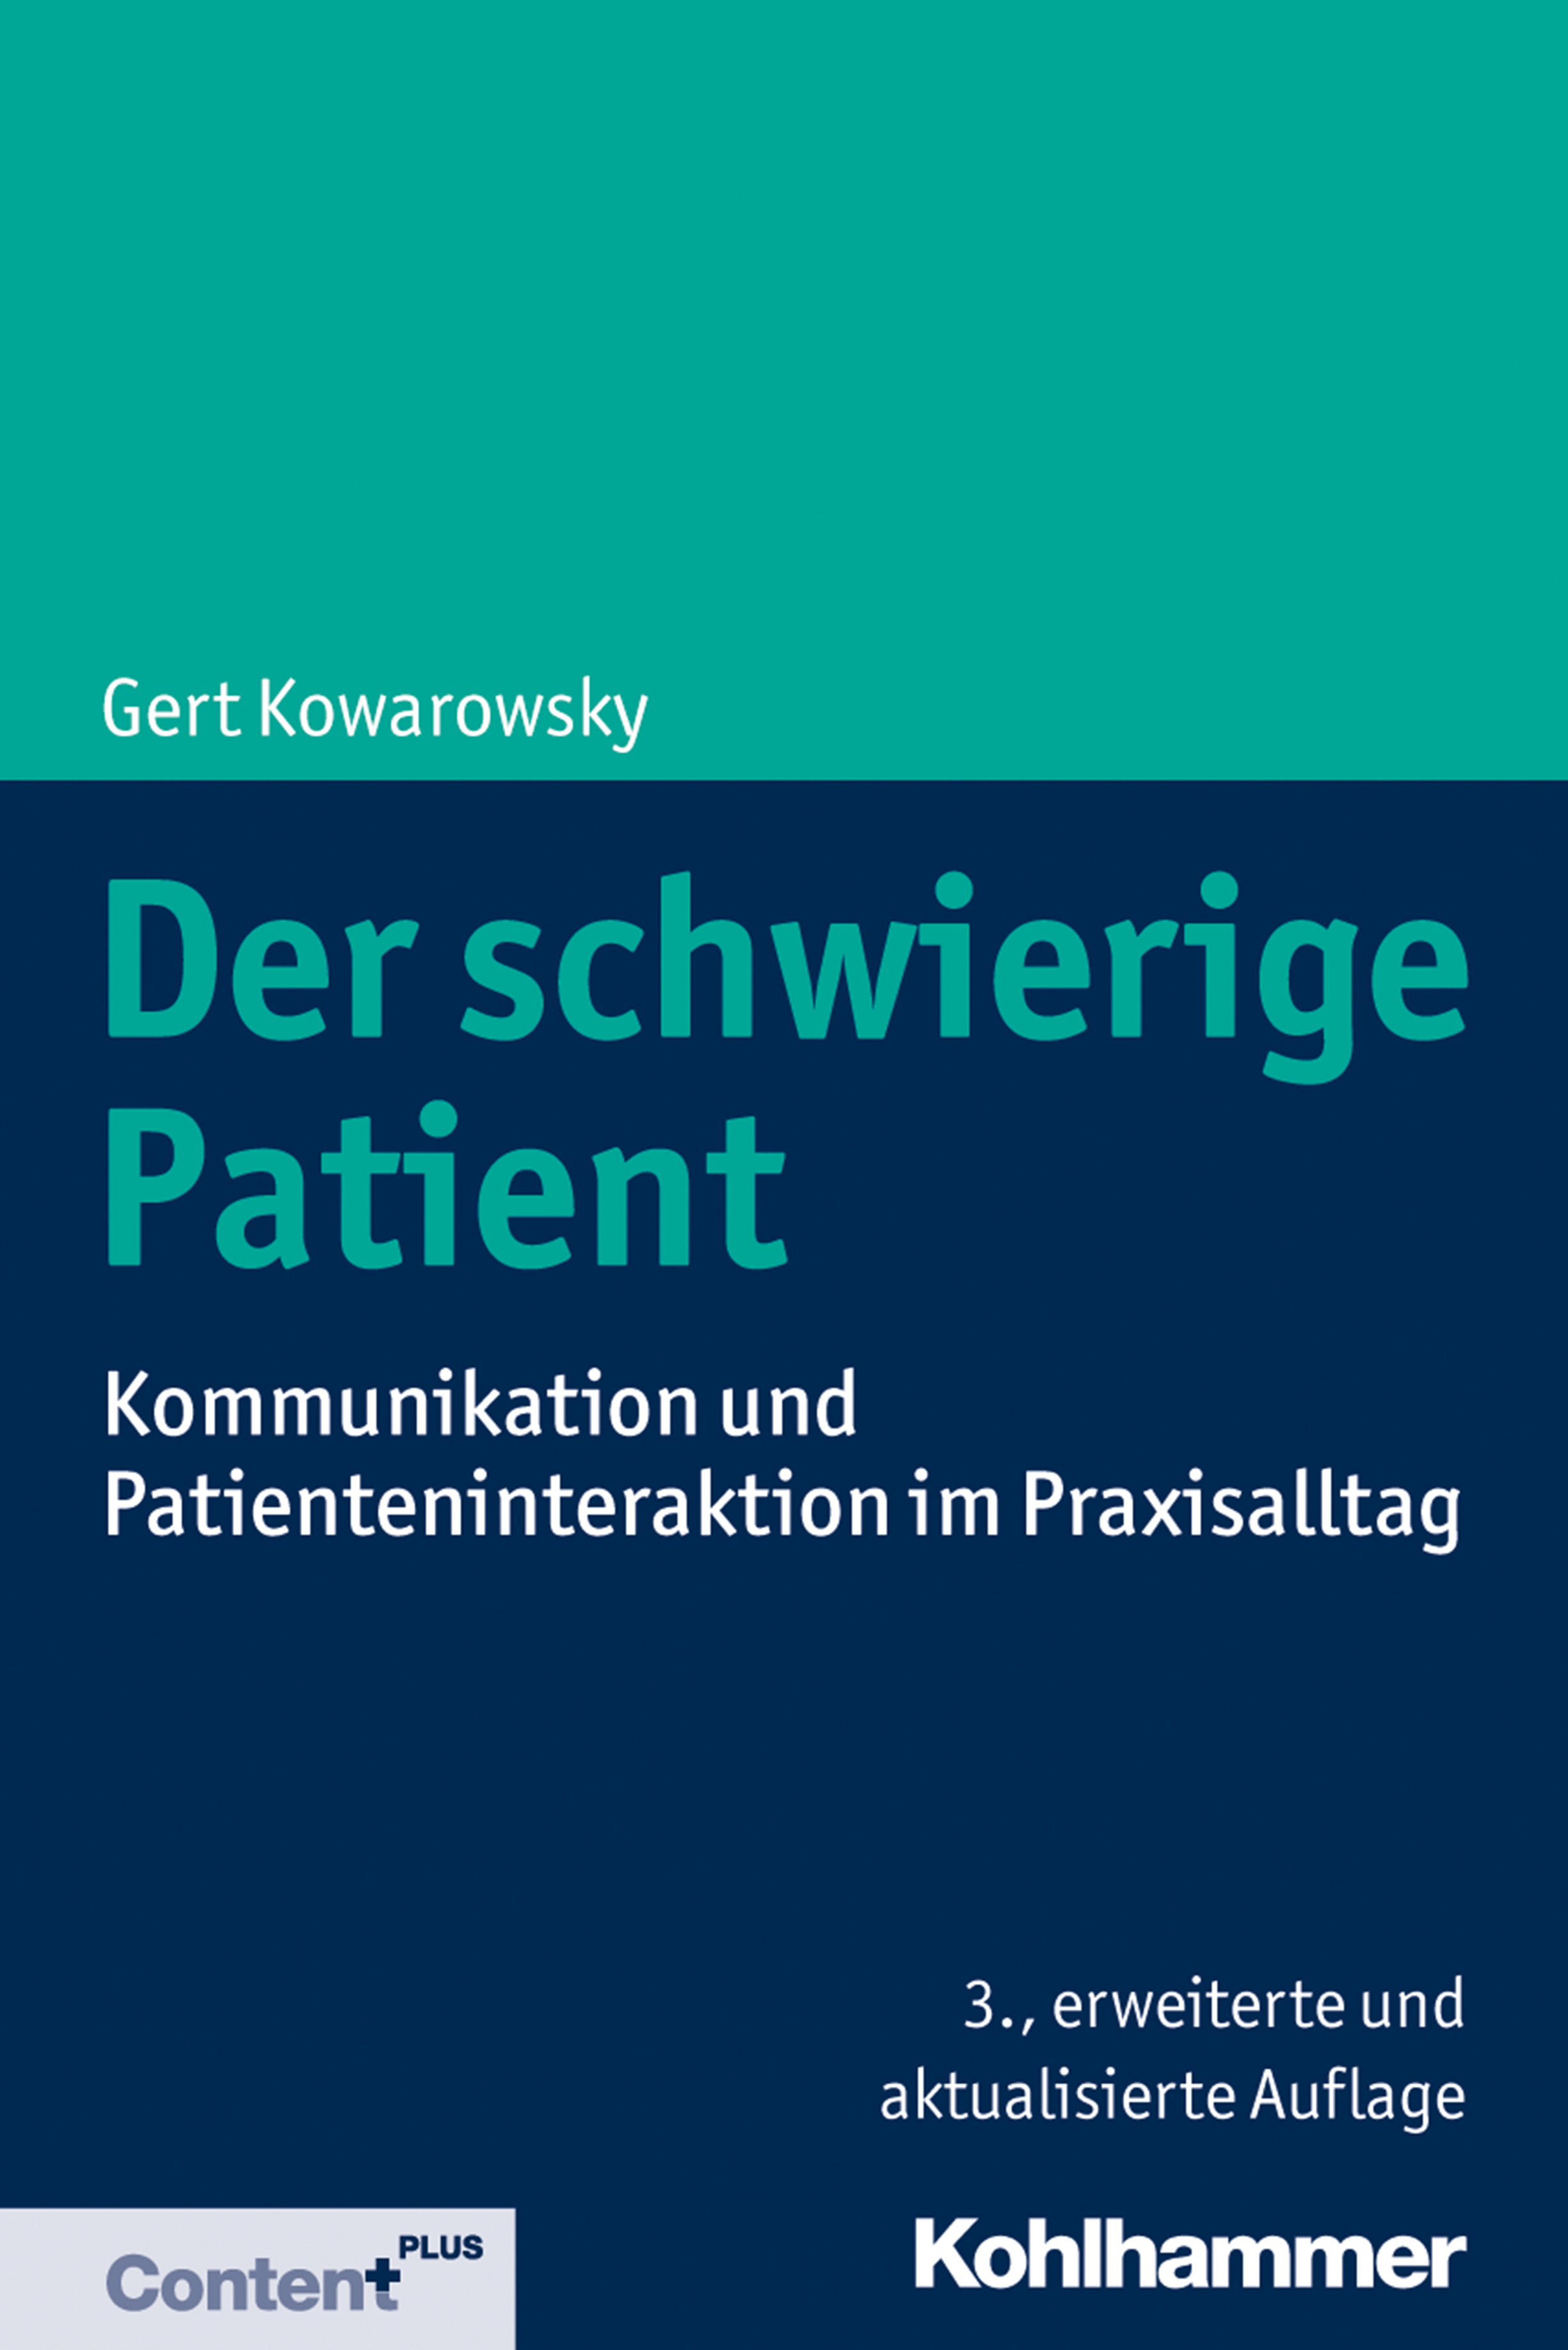 Gert Kowarowsky Der schwierige Patient gert kowarowsky der schwierige patient